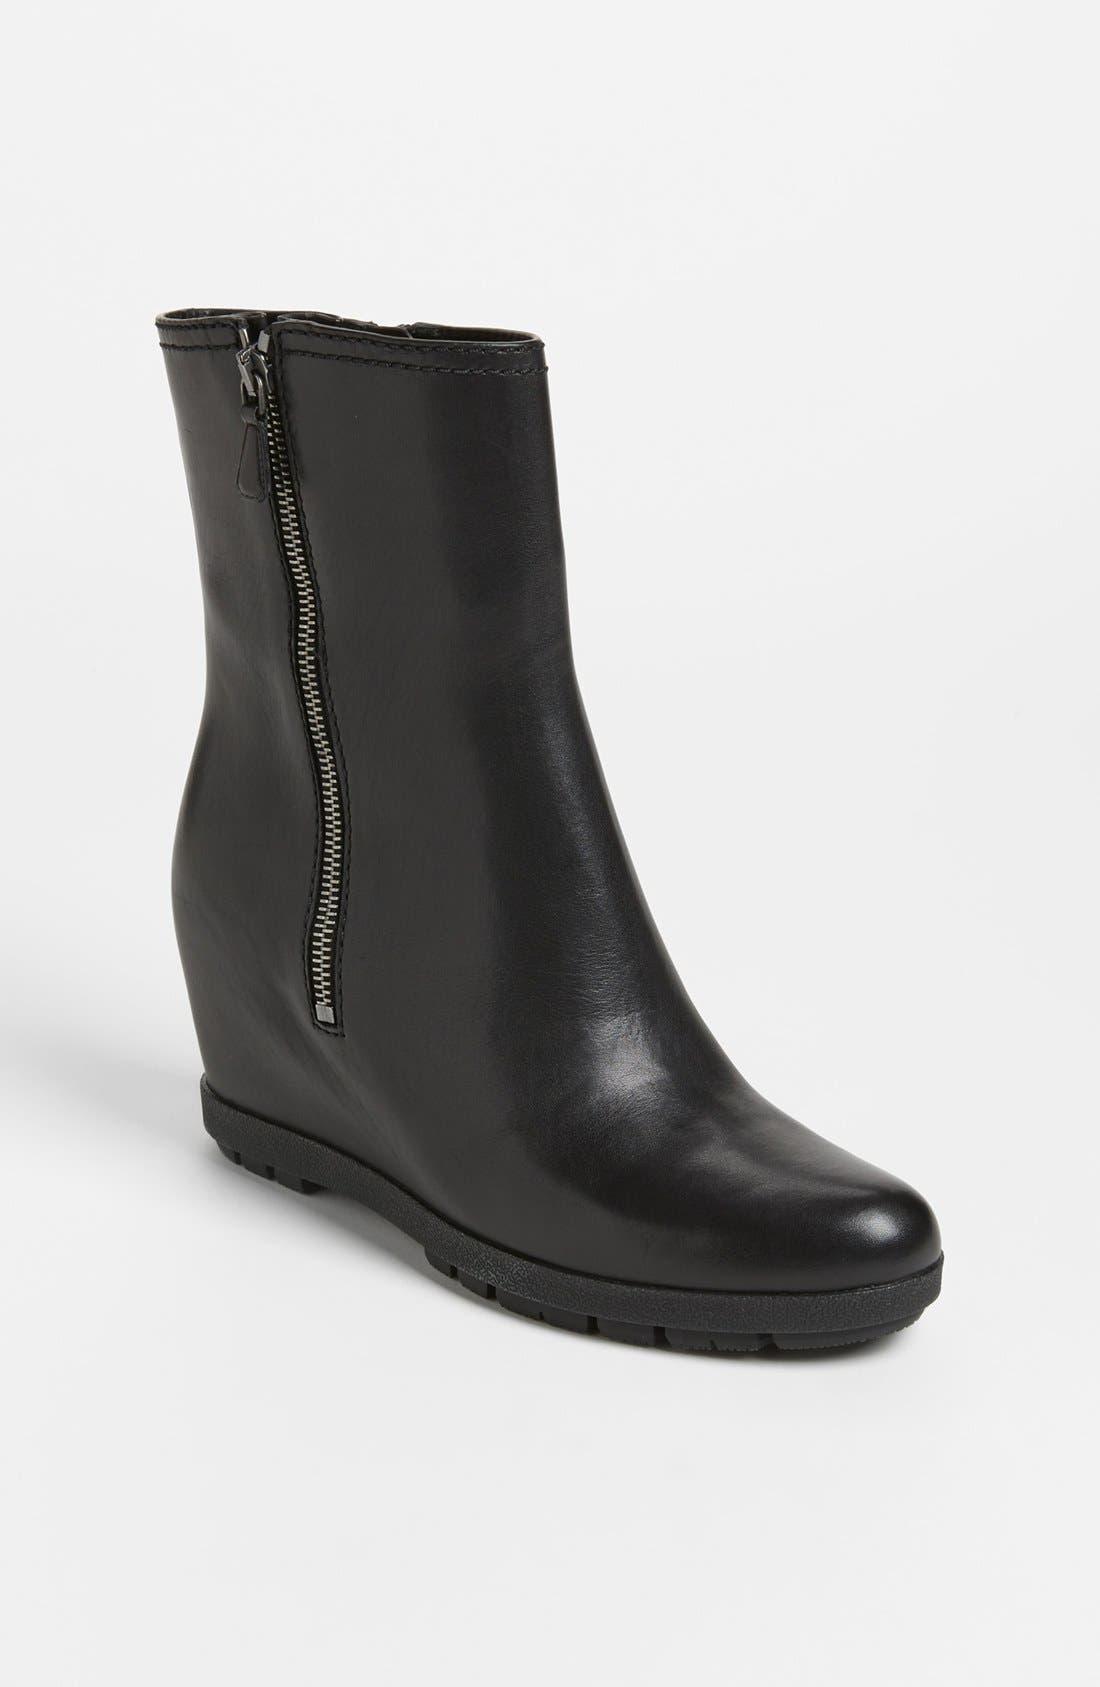 Alternate Image 1 Selected - Prada Wedge Ankle Boot